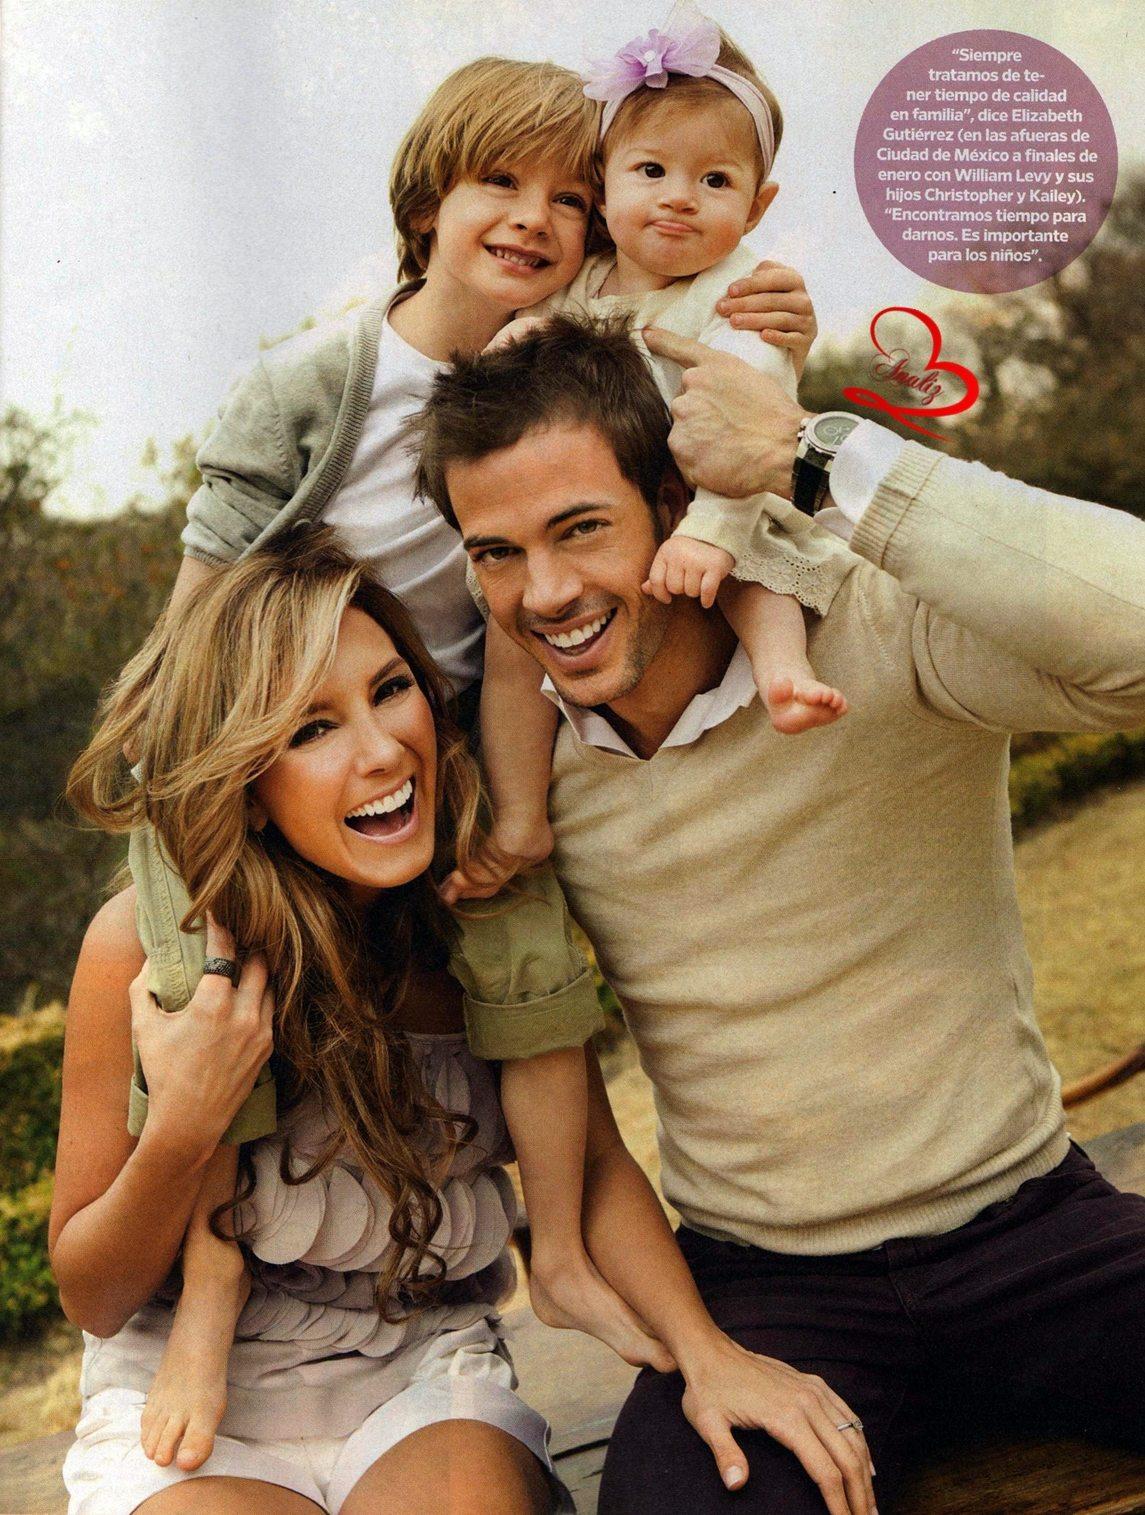 elizabeth-gutierrez-william-levy-familia-2